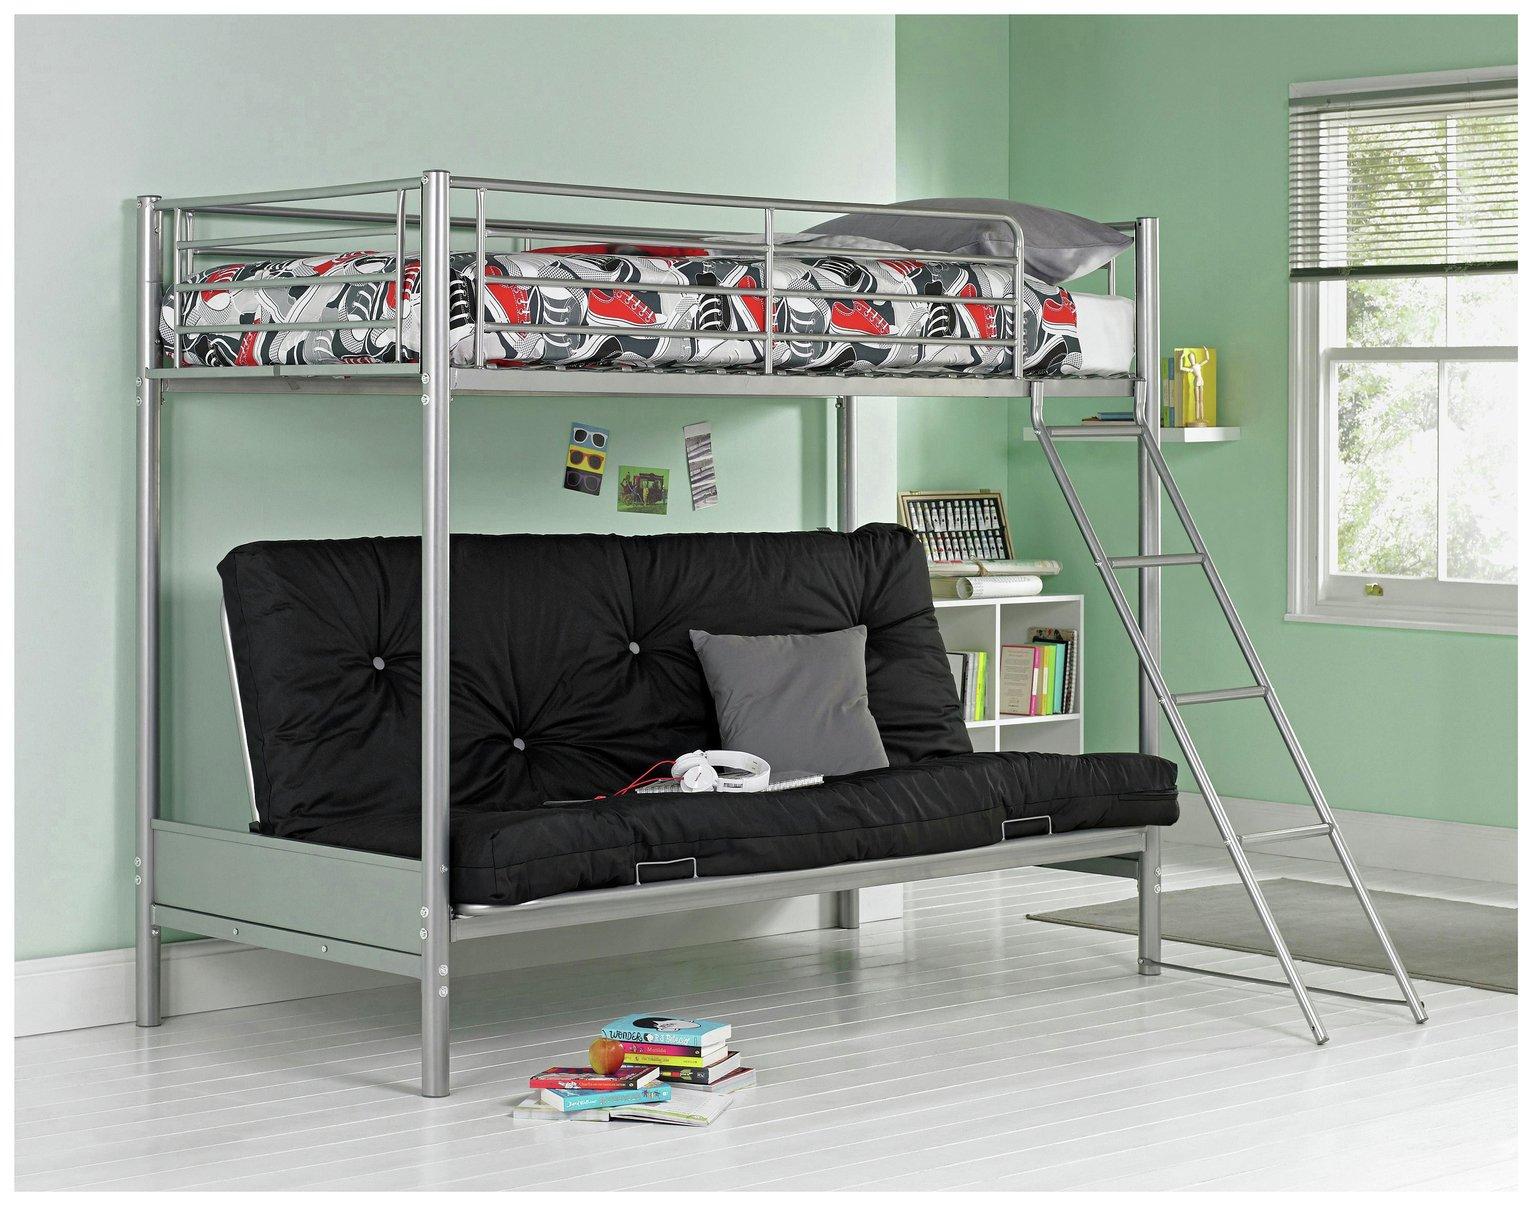 Argos Home Metal Bunk Bed, Black Futon & Kids Mattress